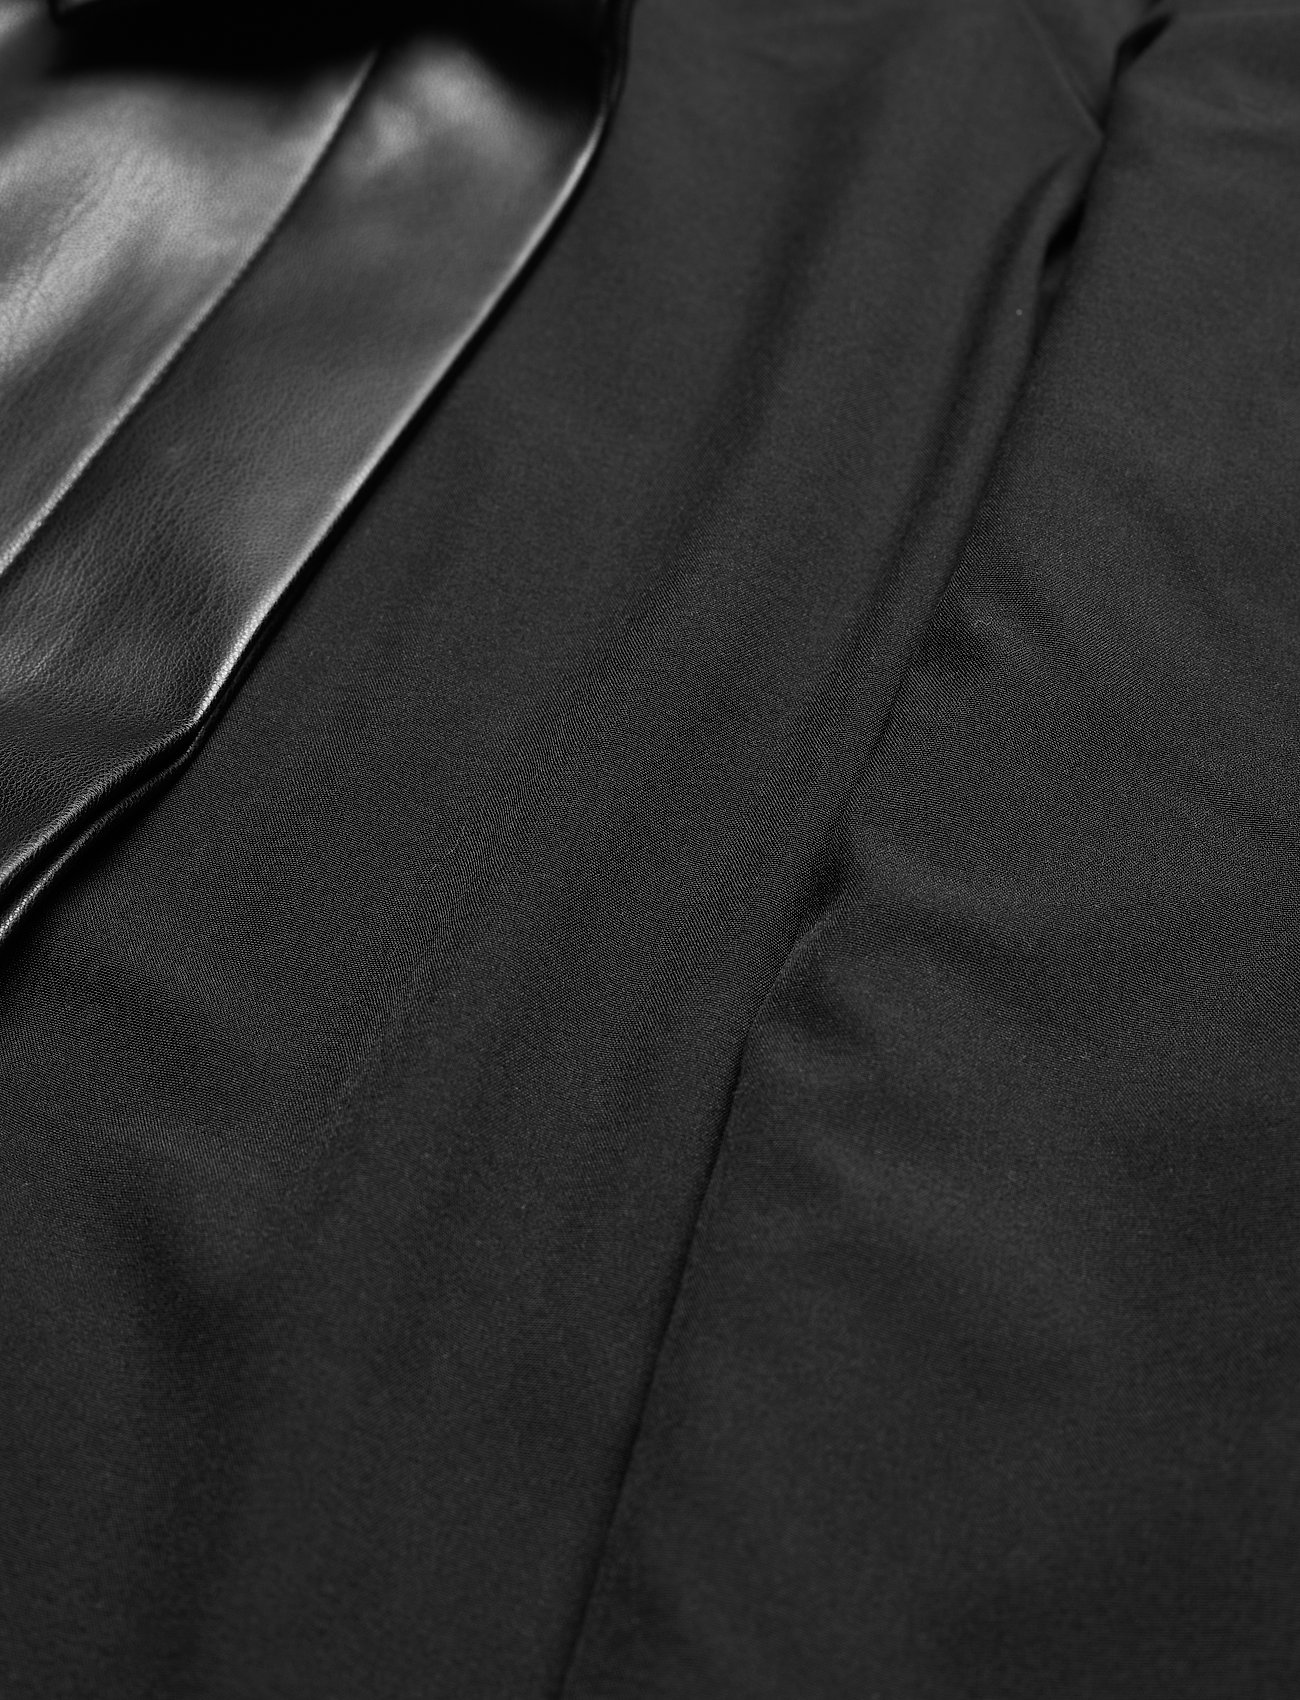 Stylein - VEREL JACKET - lederjacken - black - 5